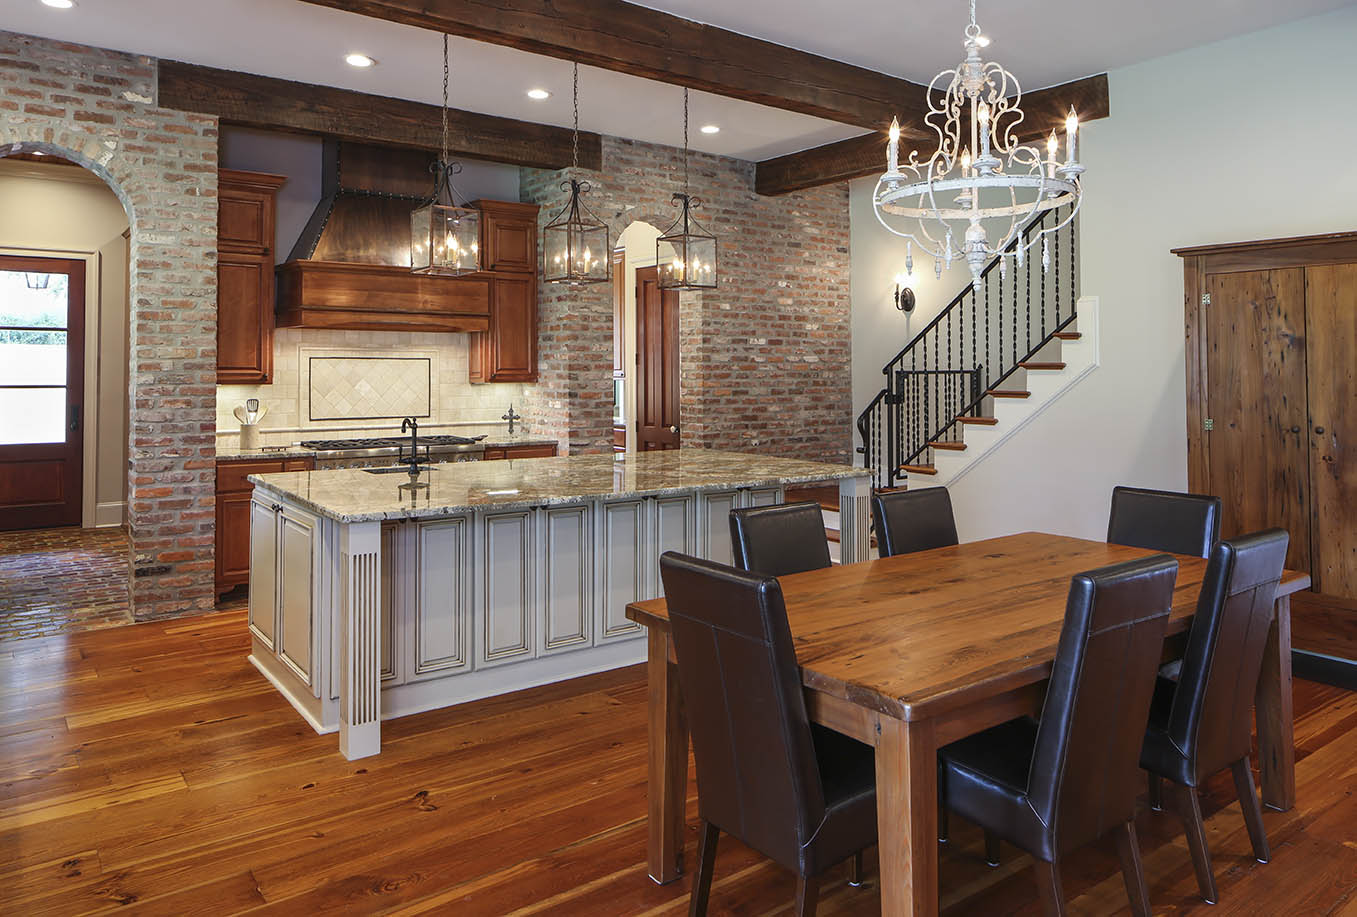 Kitchen To Bath Concepts in Baton Rouge, La